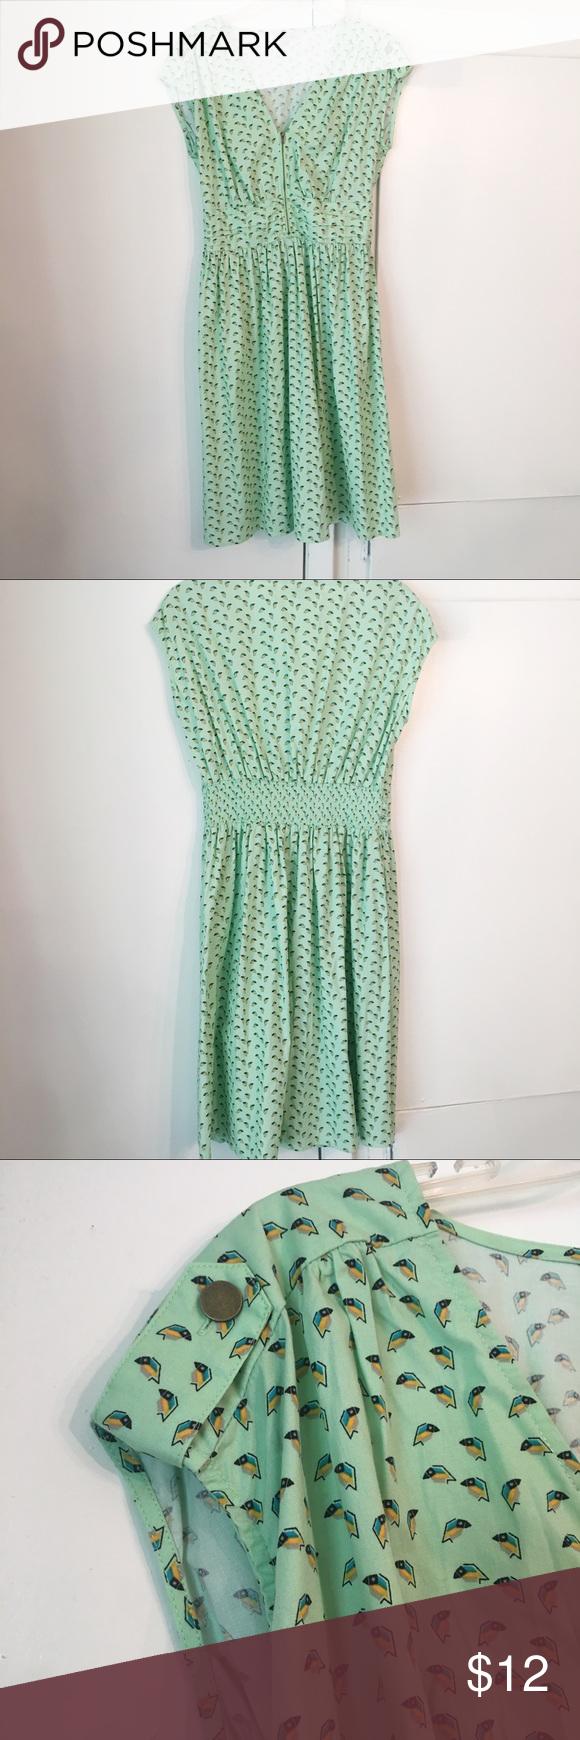 Downeast Zip Up Tea Dress Size Large Ecu Tea Dress Large Size Dresses Summer Fashion Dresses [ 1740 x 580 Pixel ]